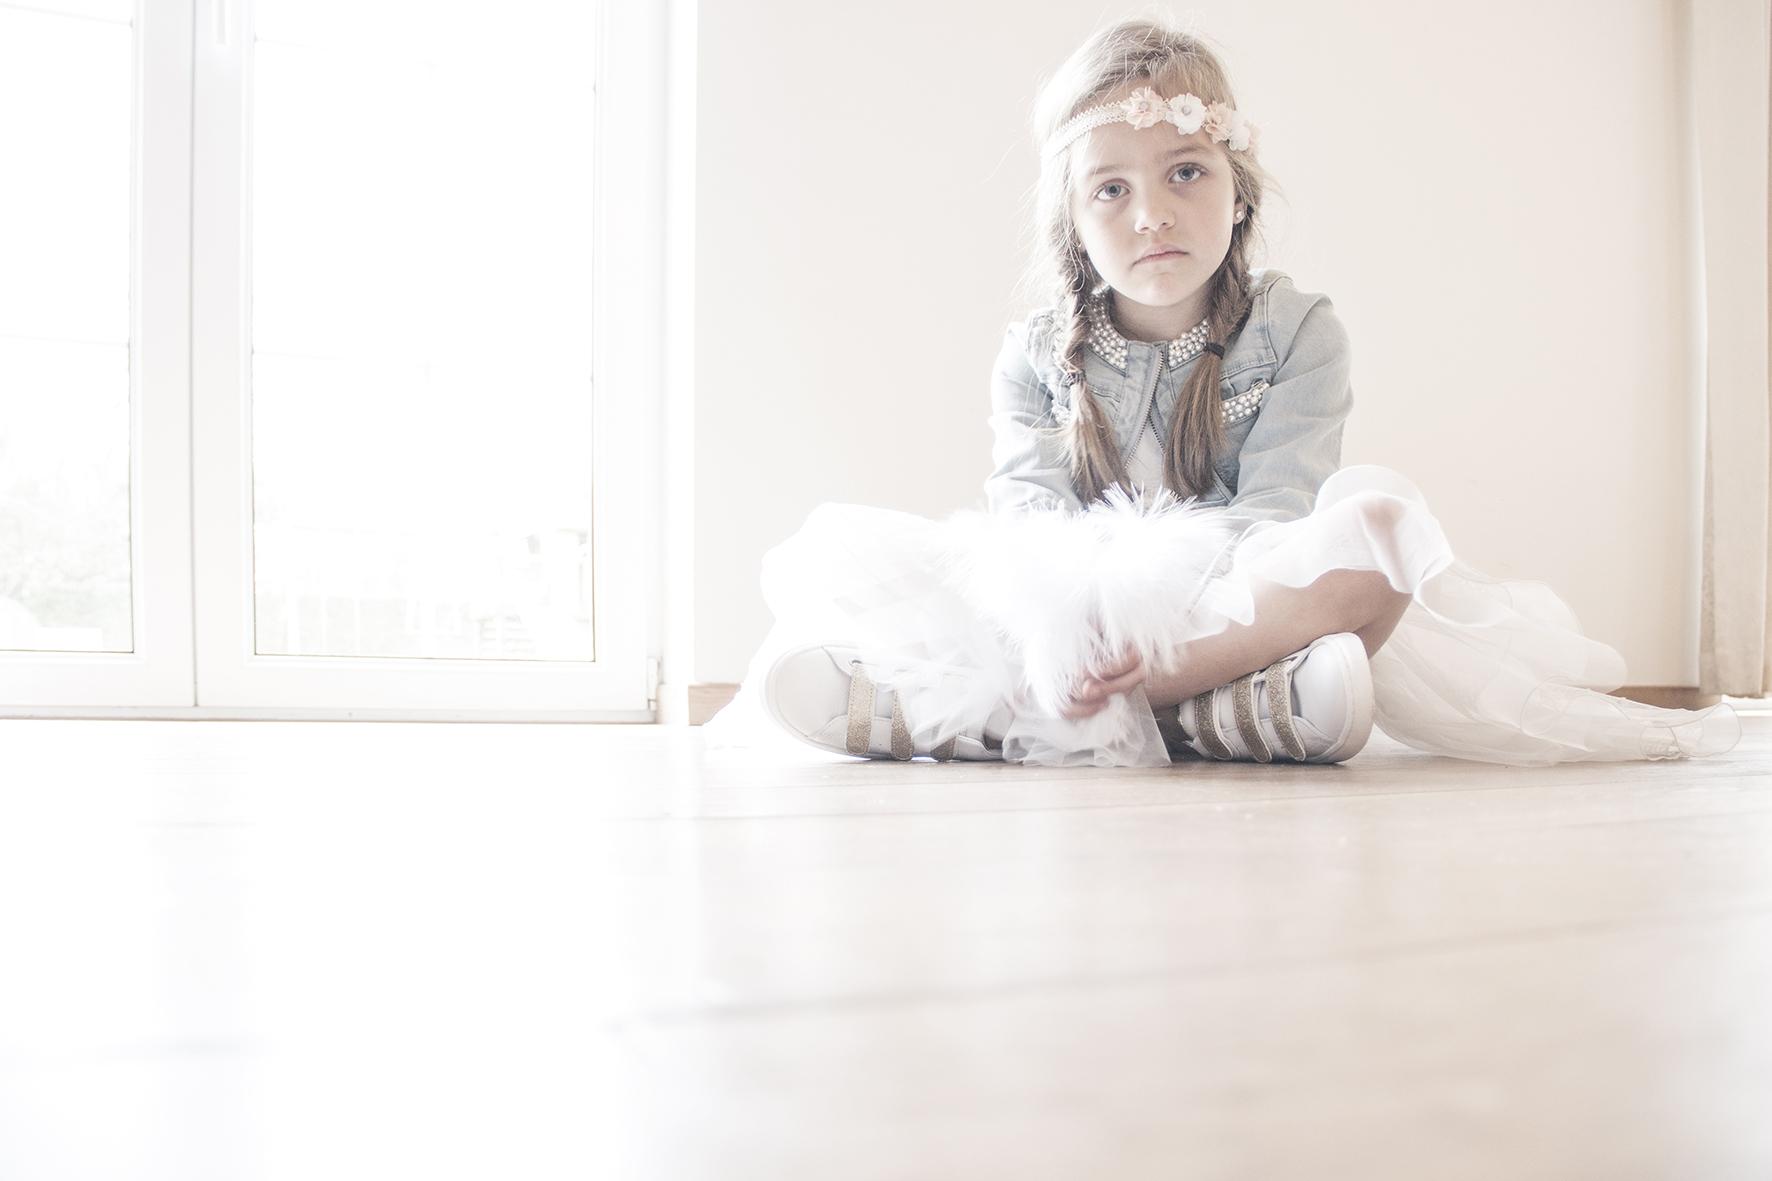 Elsbeth_Neyens_feest_3